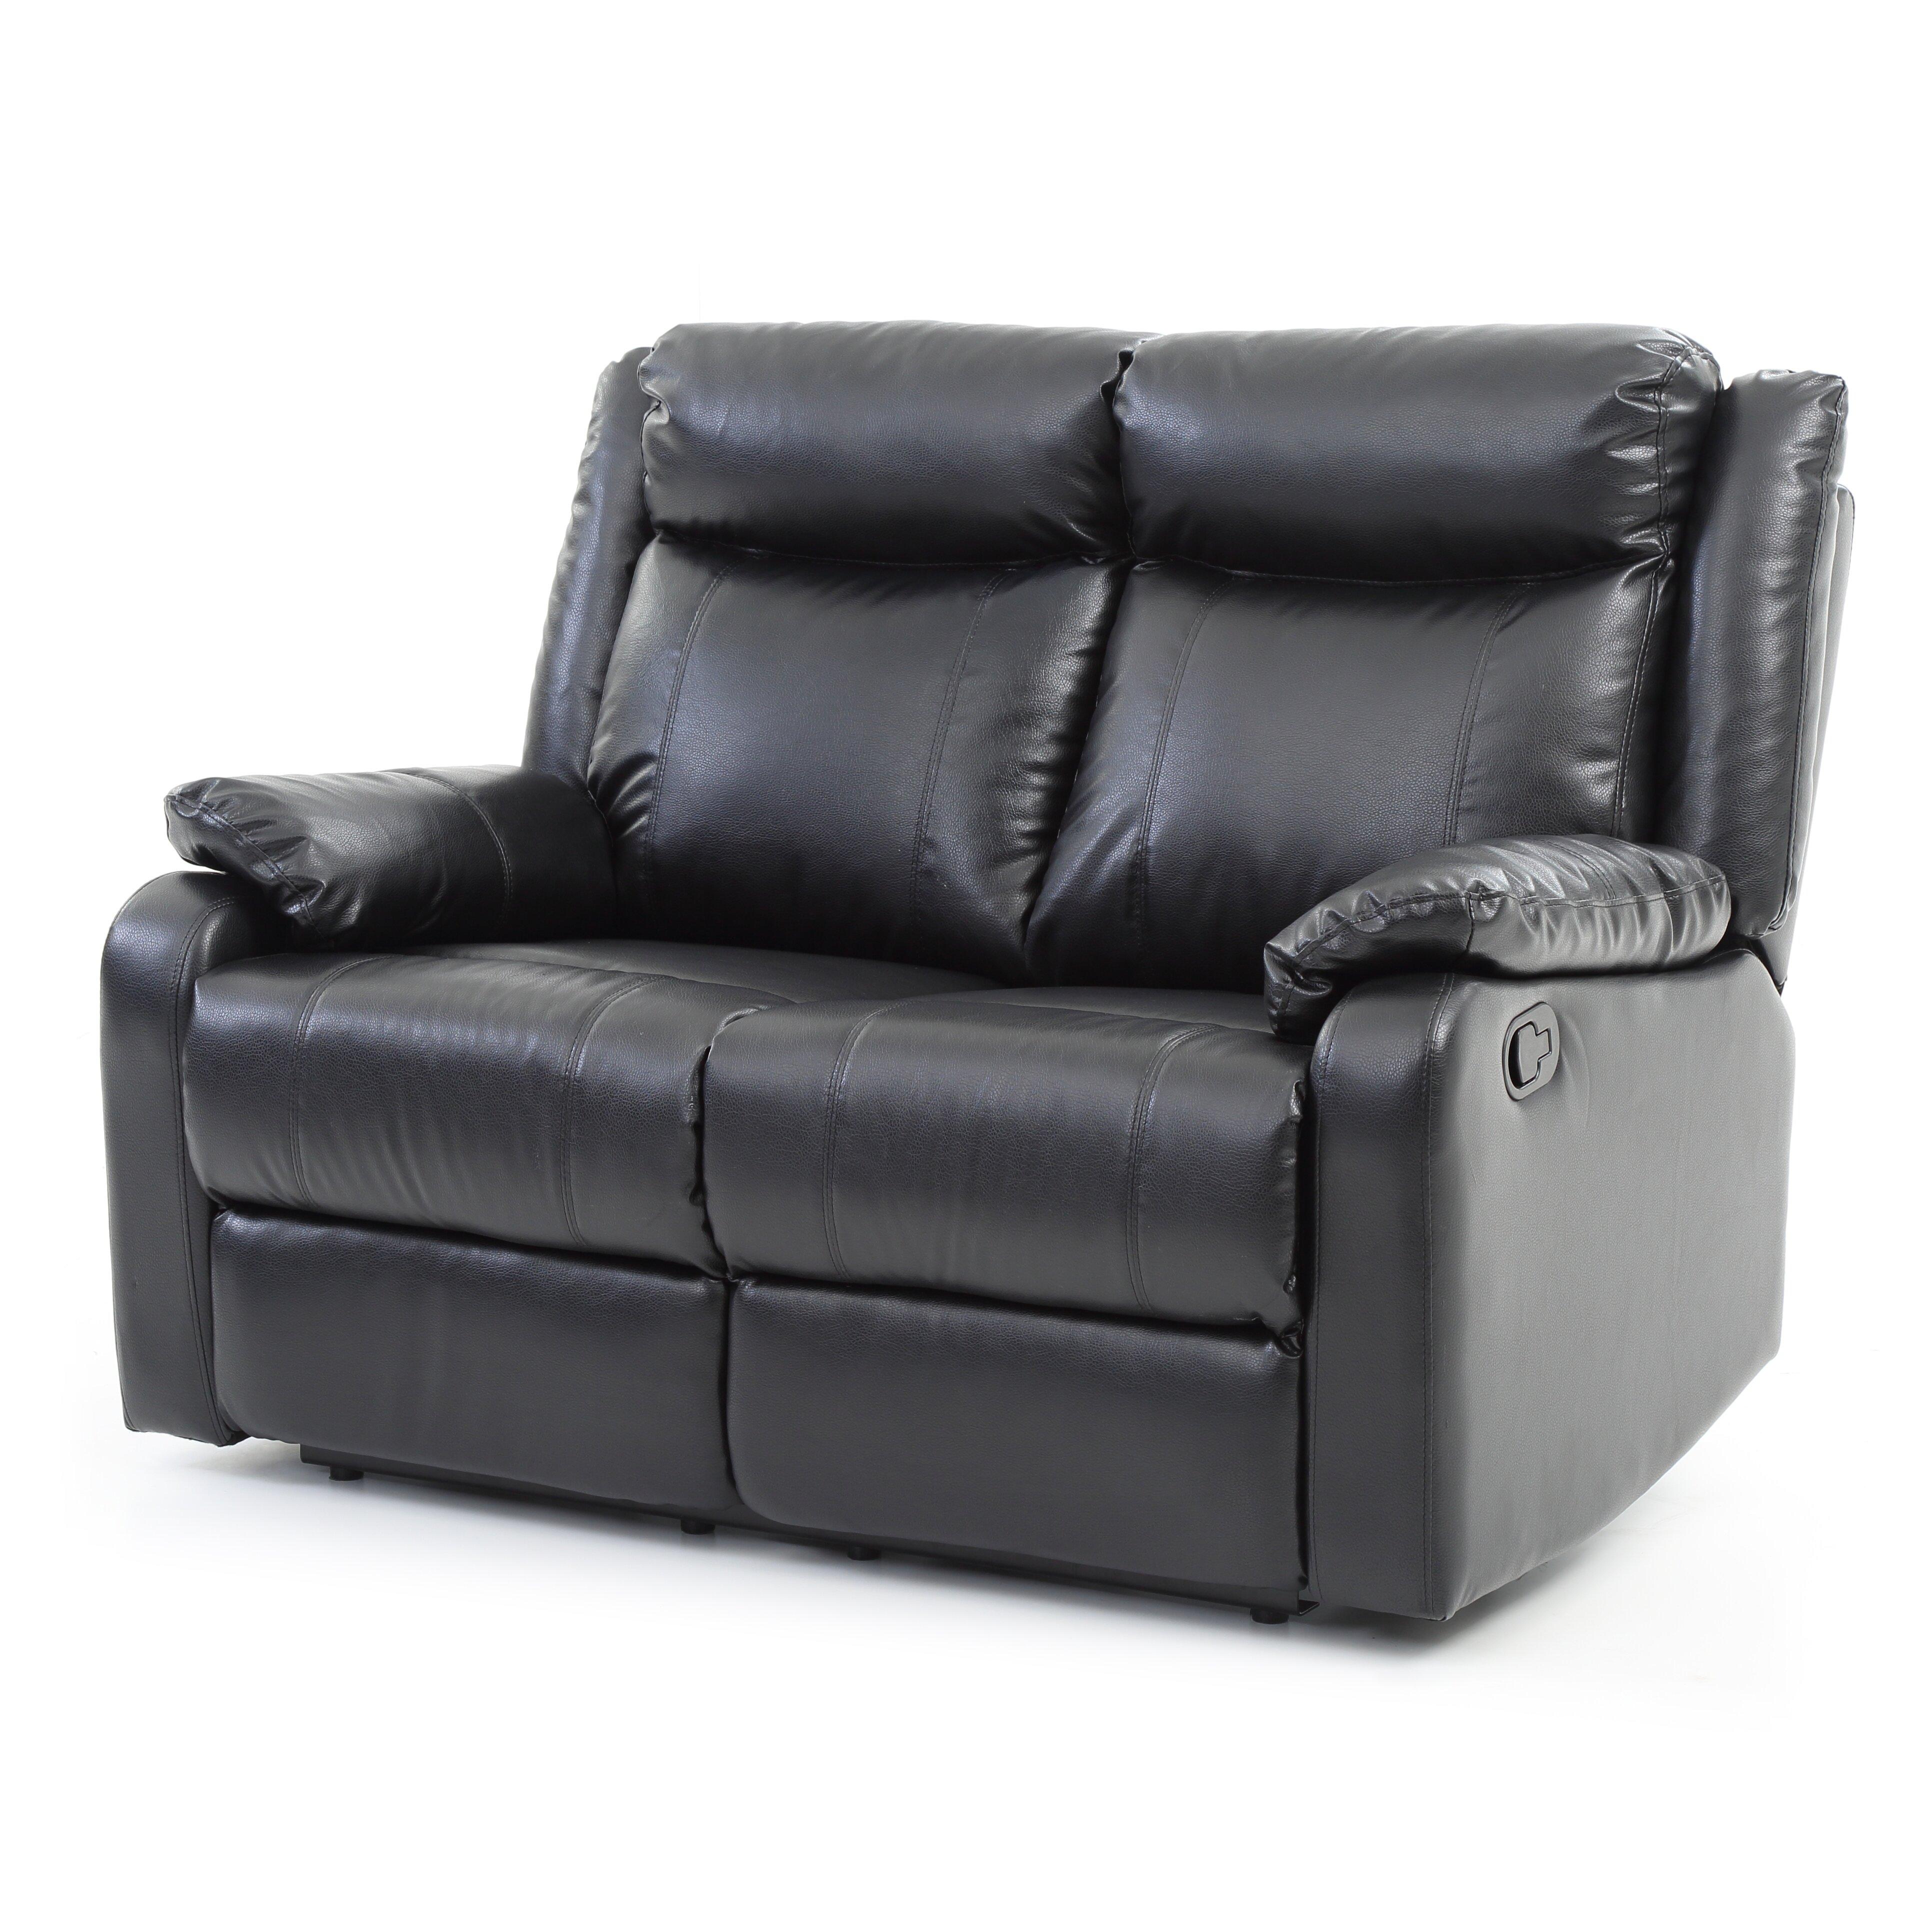 Glory Furniture Boston Double Reclining Leather Loveseat Wayfair